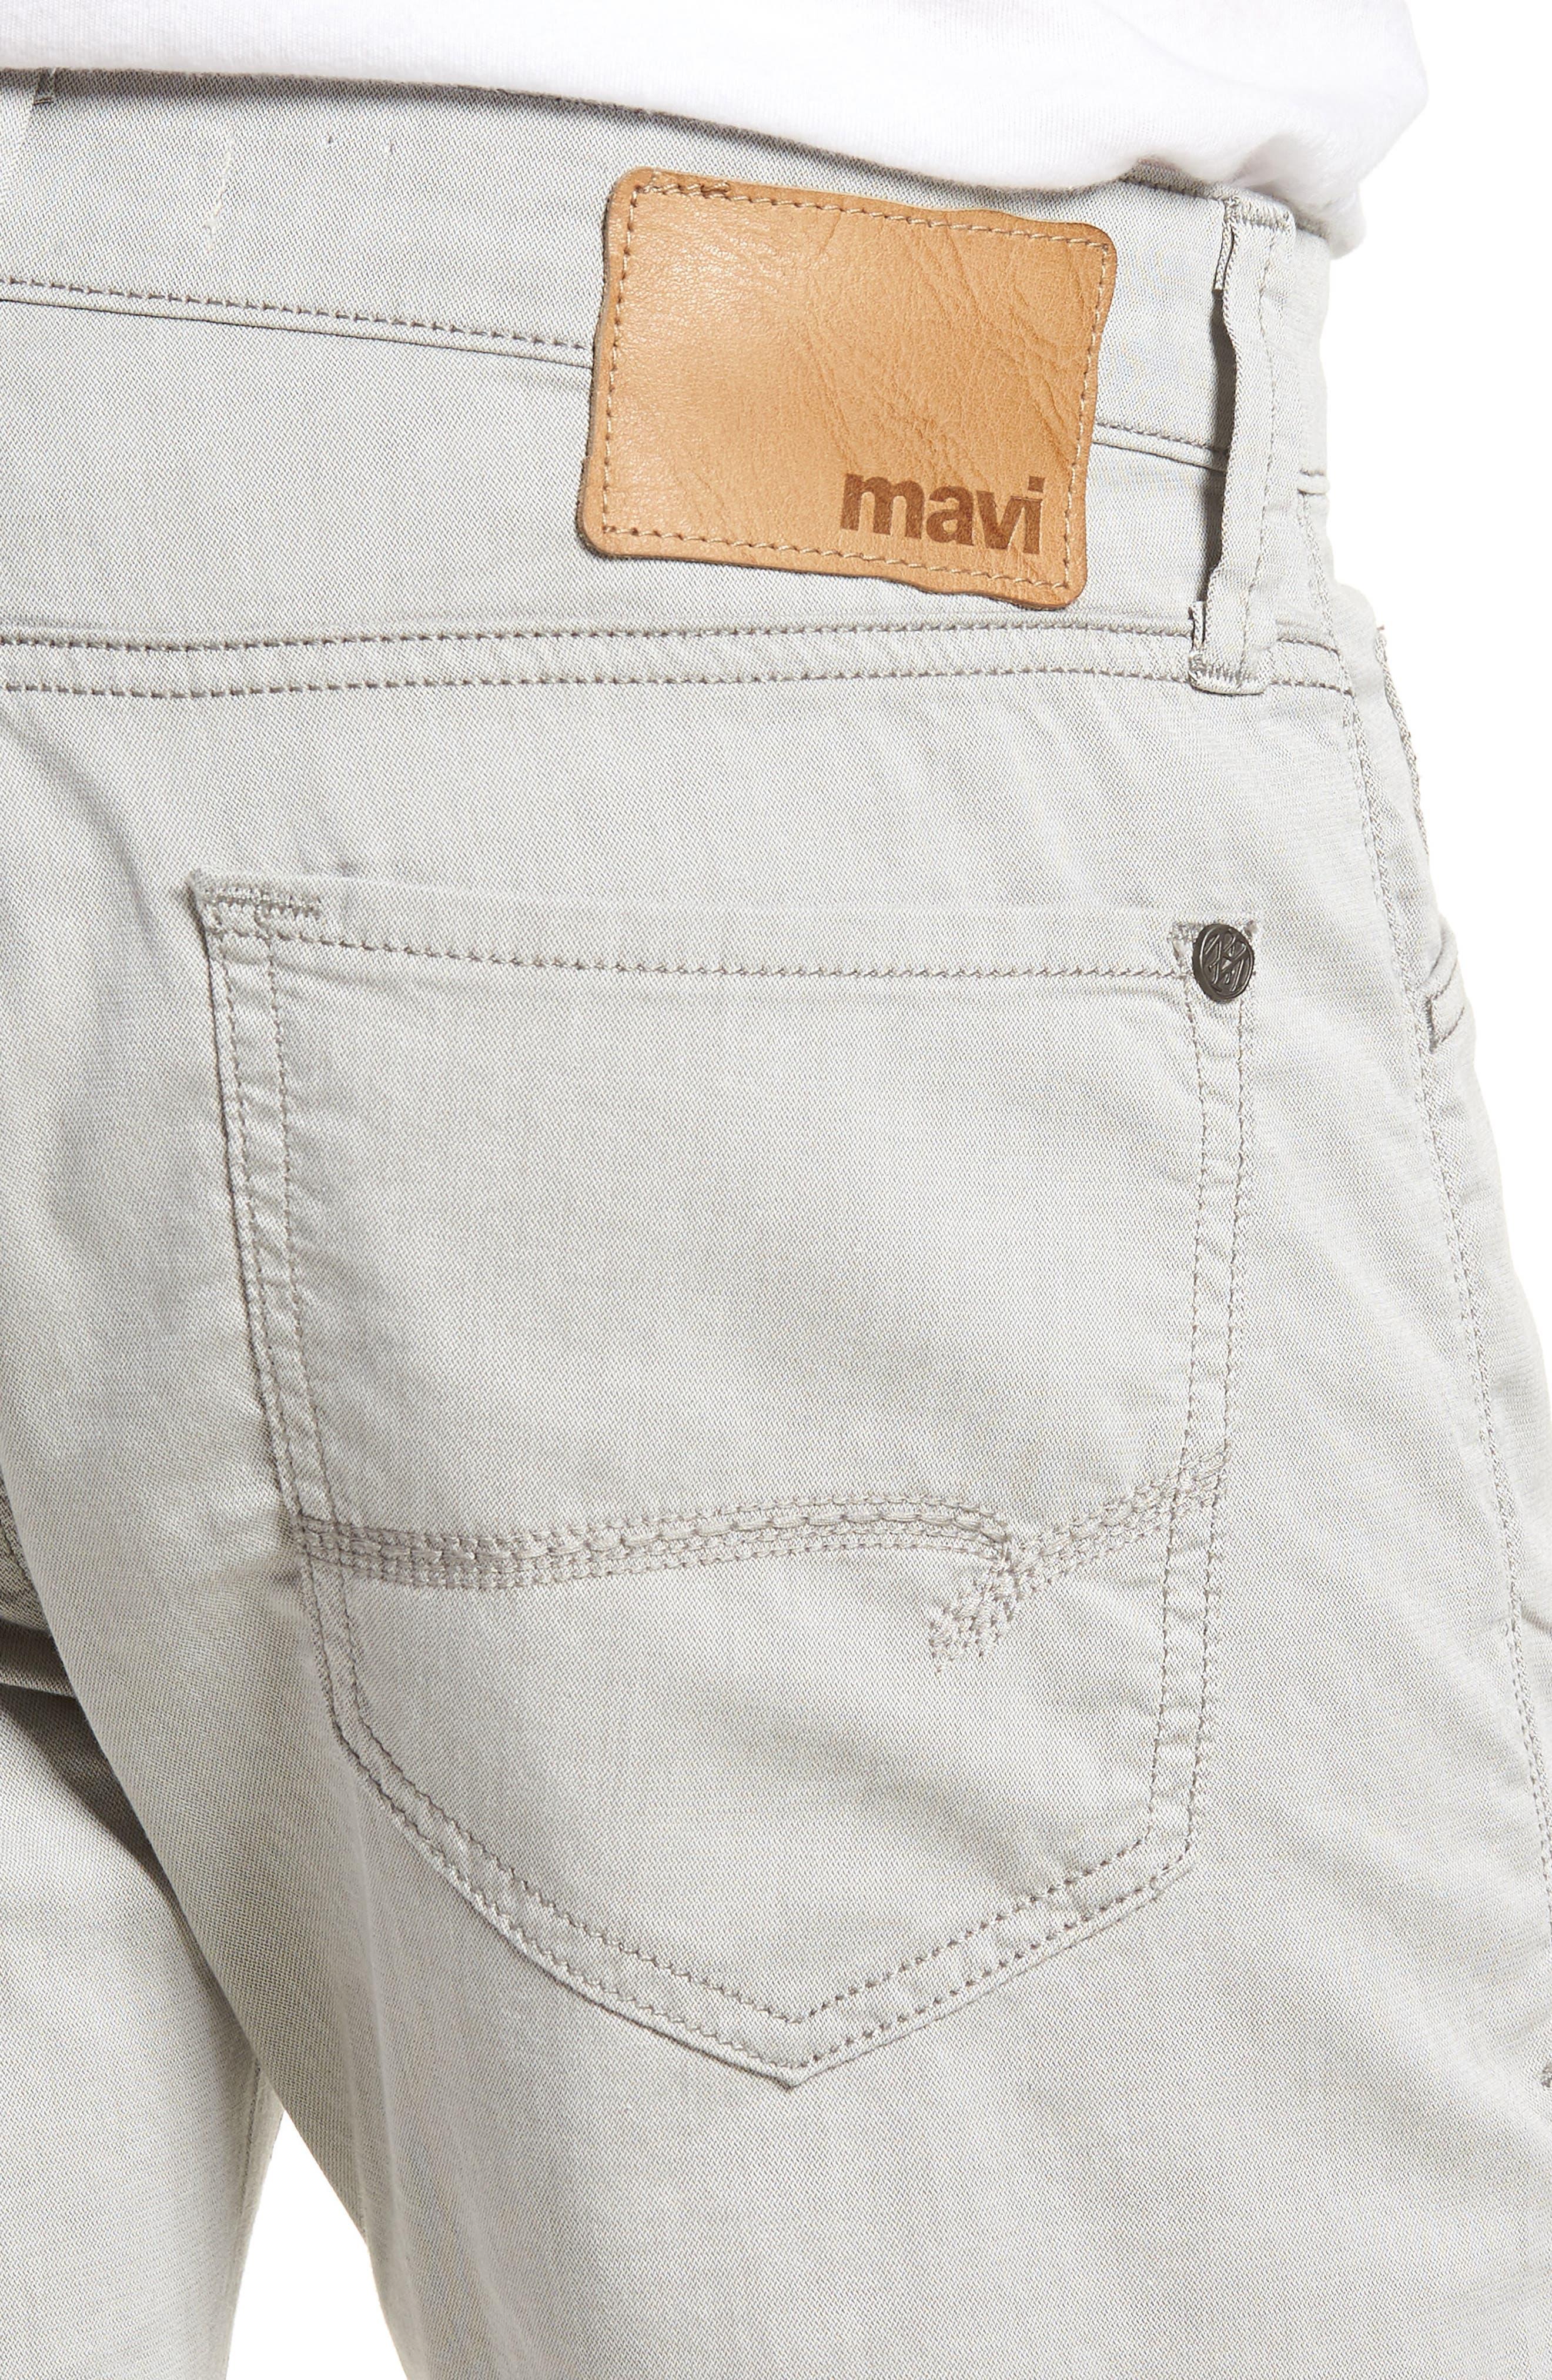 Jake Slim Fit Jeans,                             Alternate thumbnail 4, color,                             Latte Reversed